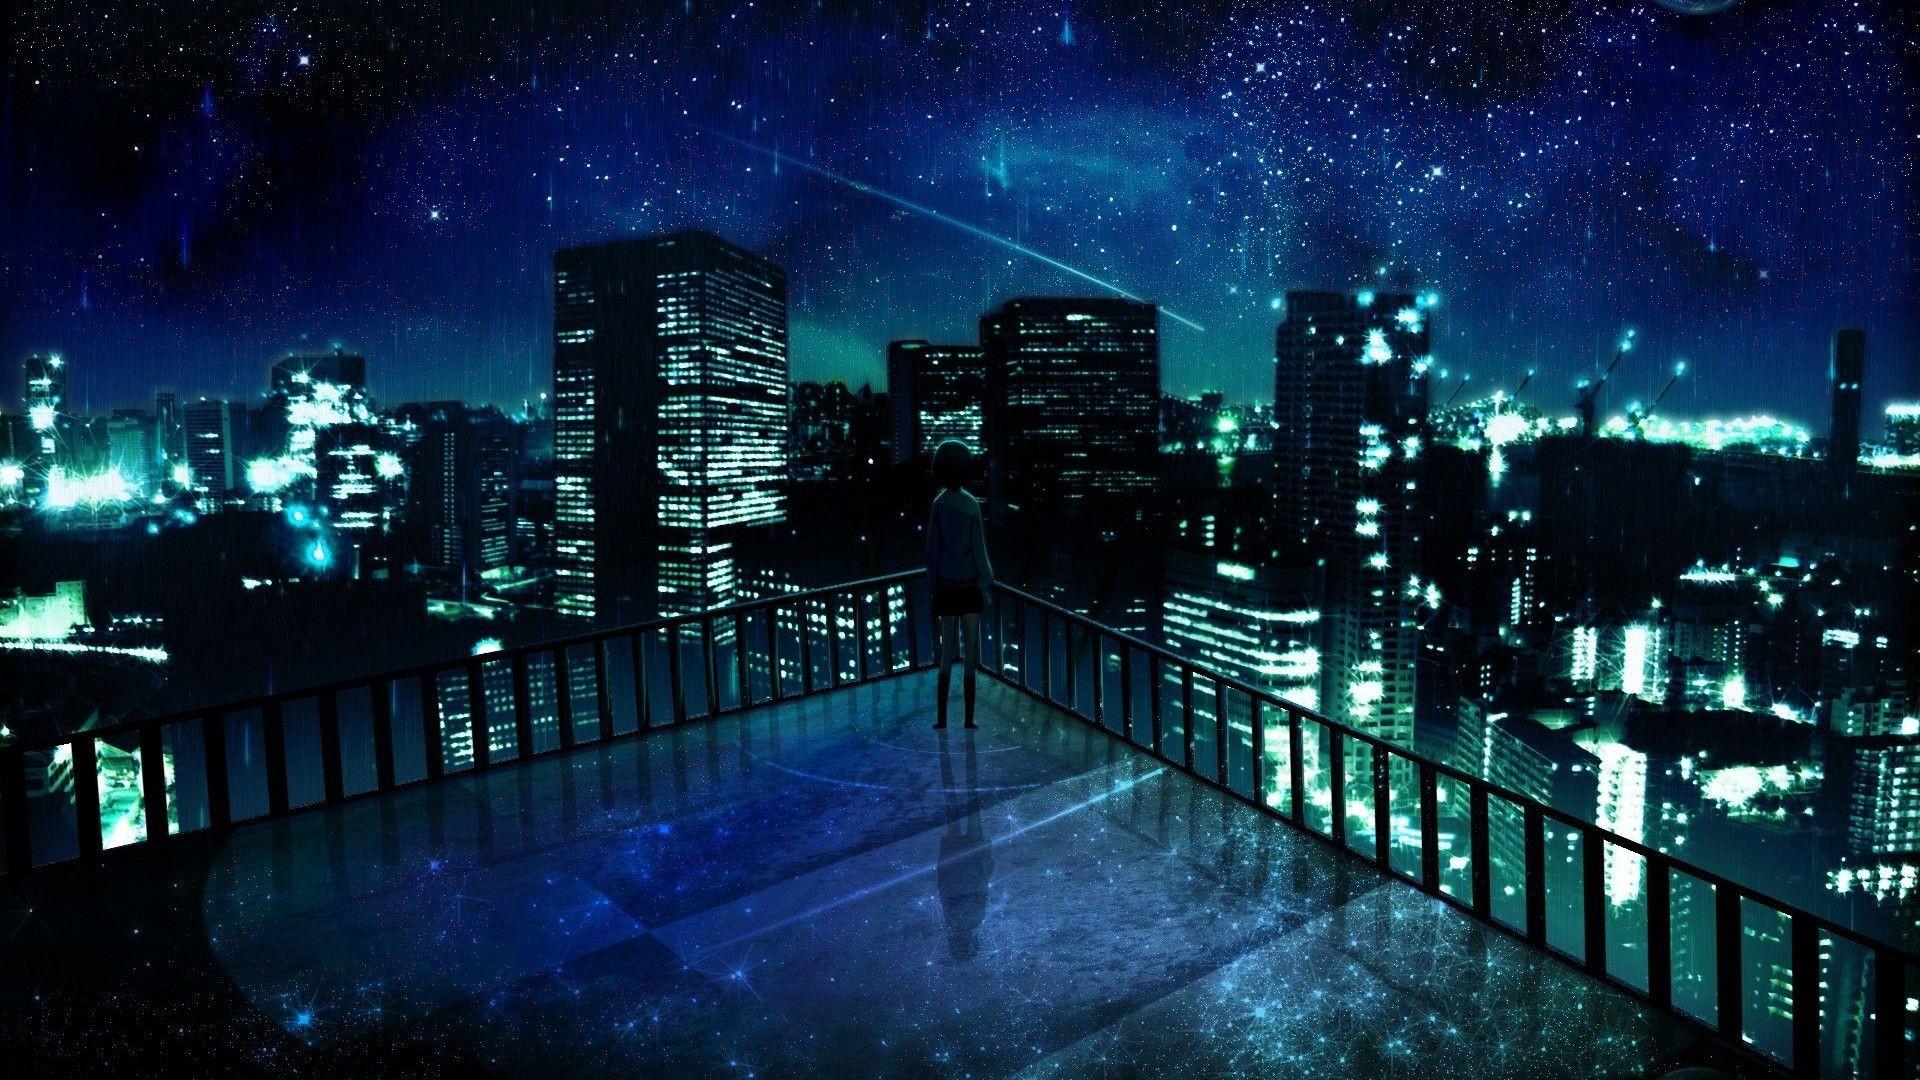 1920x1080, Stunning Anime City Wallpaper 42583   Data - Anime Dark City Background - HD Wallpaper